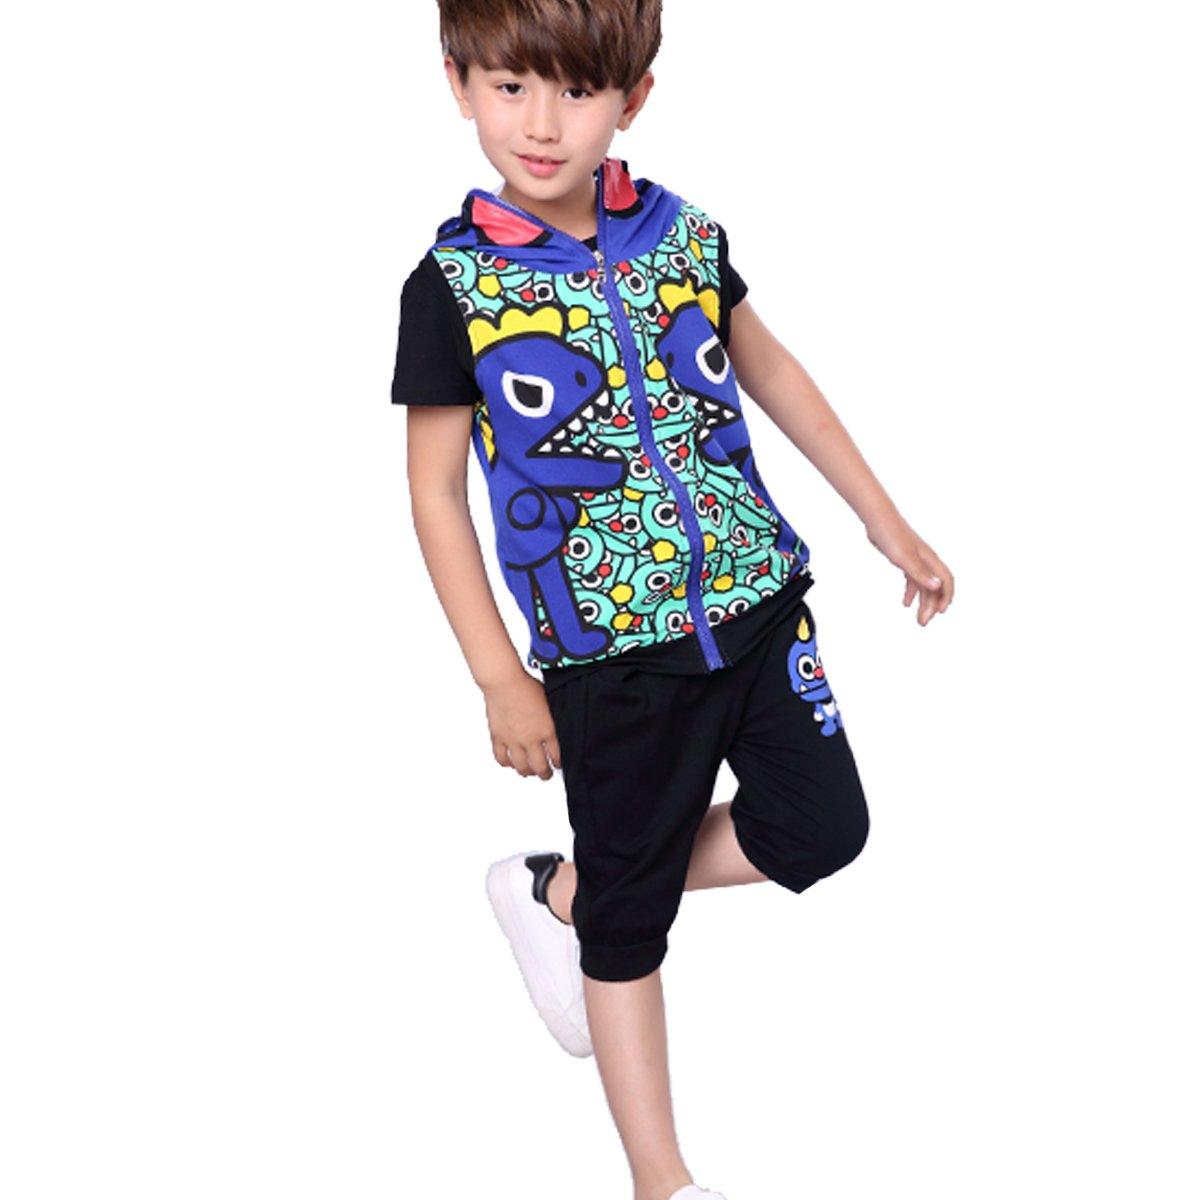 OnlyAngel Boys 3 Piece Outfits Zipper Vest Coat & Dinosaur Pattern T-Shirts & Elastic Pnats Set Size 4-12 Yrs (7-8 Years, Blue)